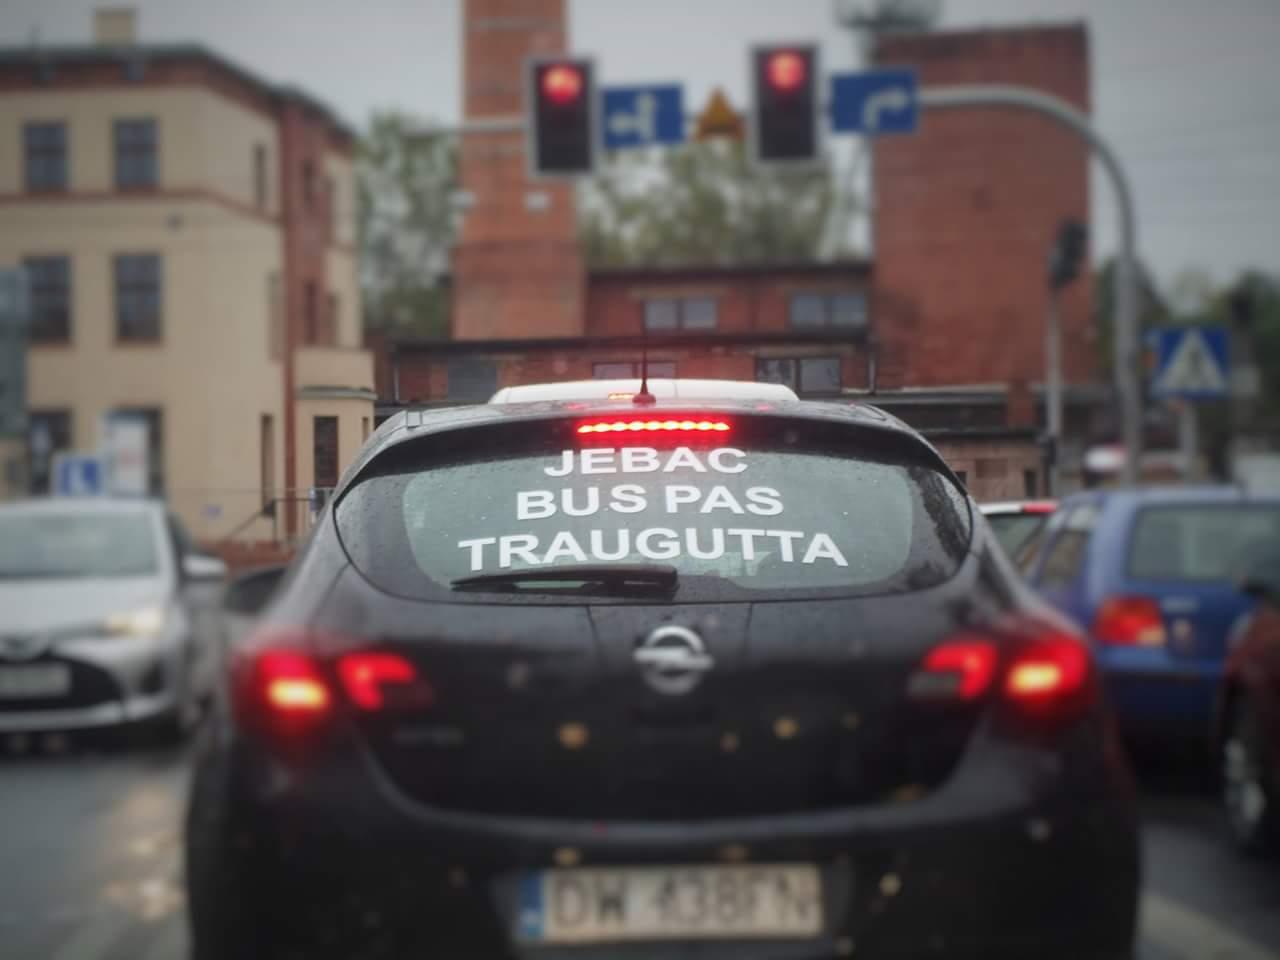 Na ulice Traugutta wrócił buspas.